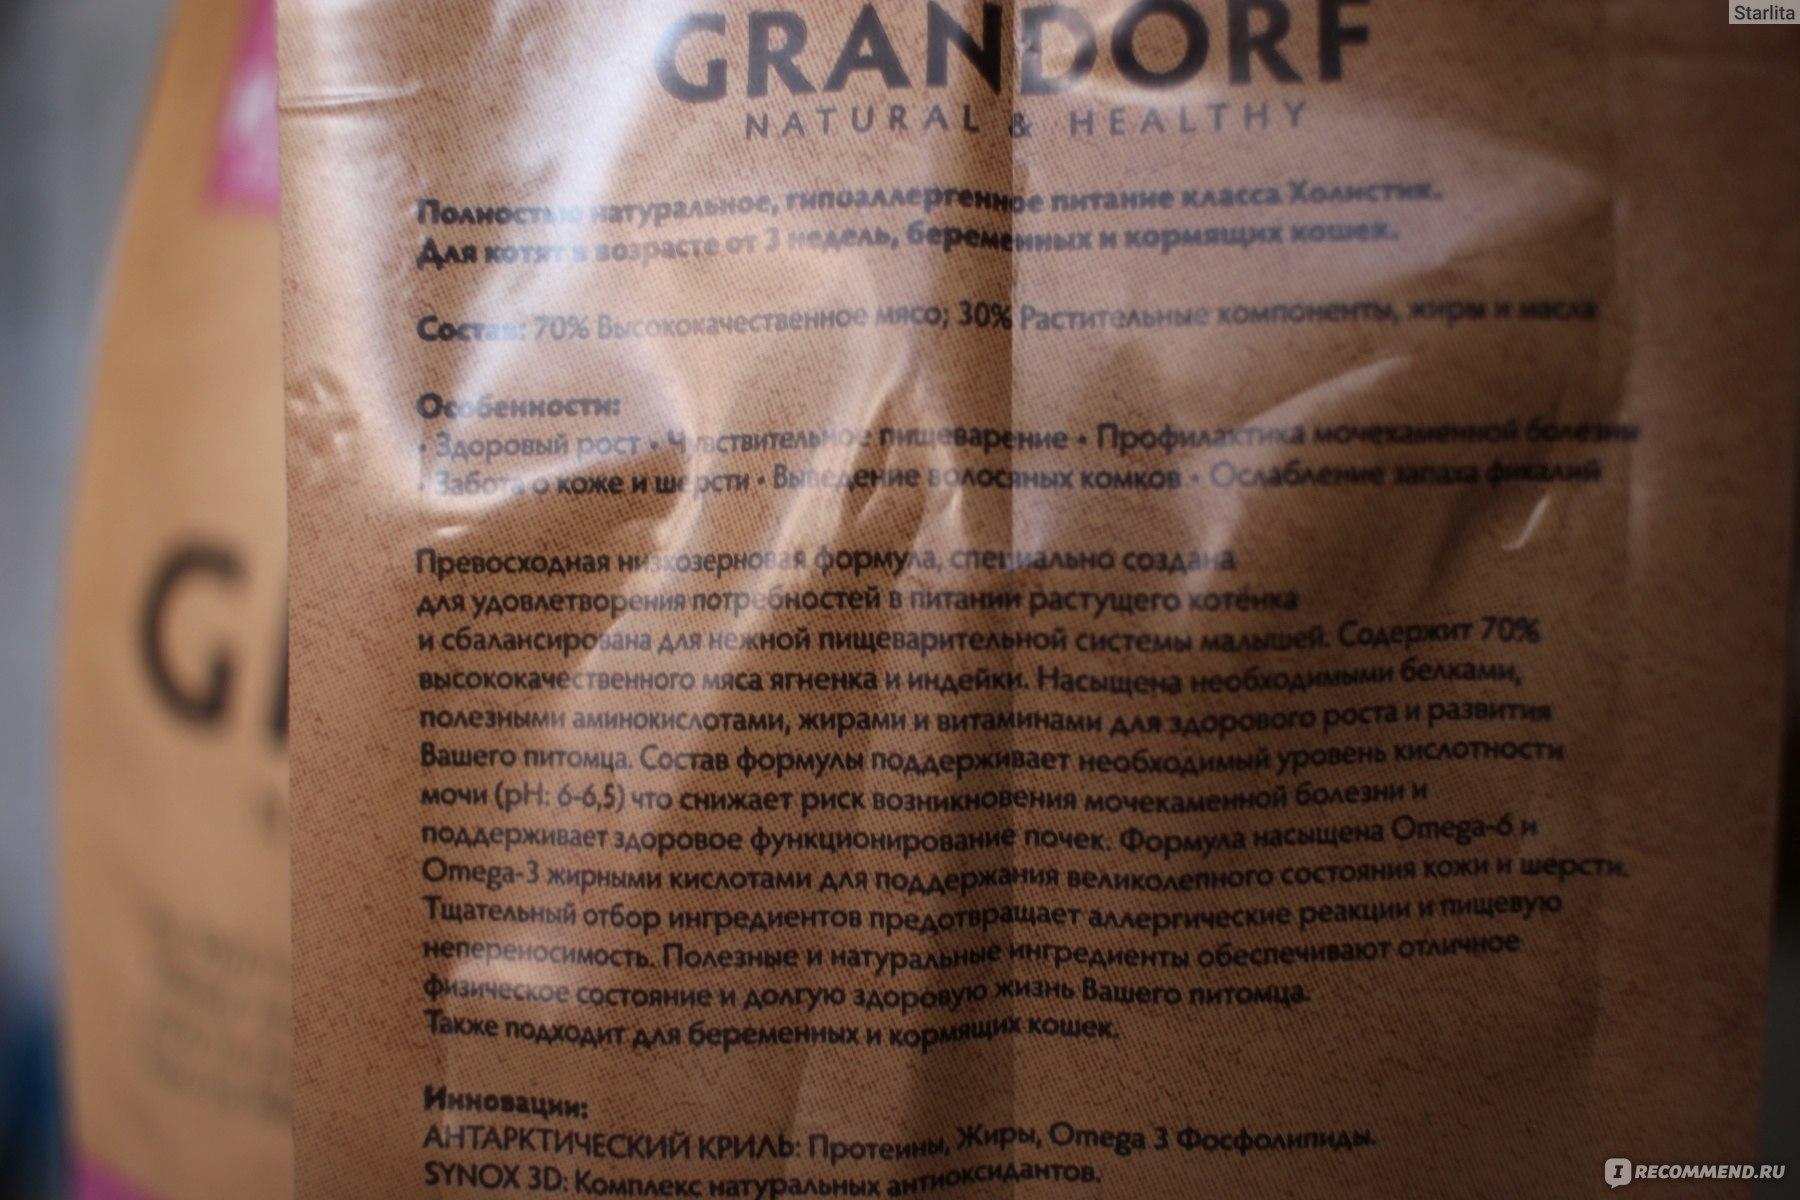 Корм для кошек «Грандорф»: какими преимуществами обладают холистики